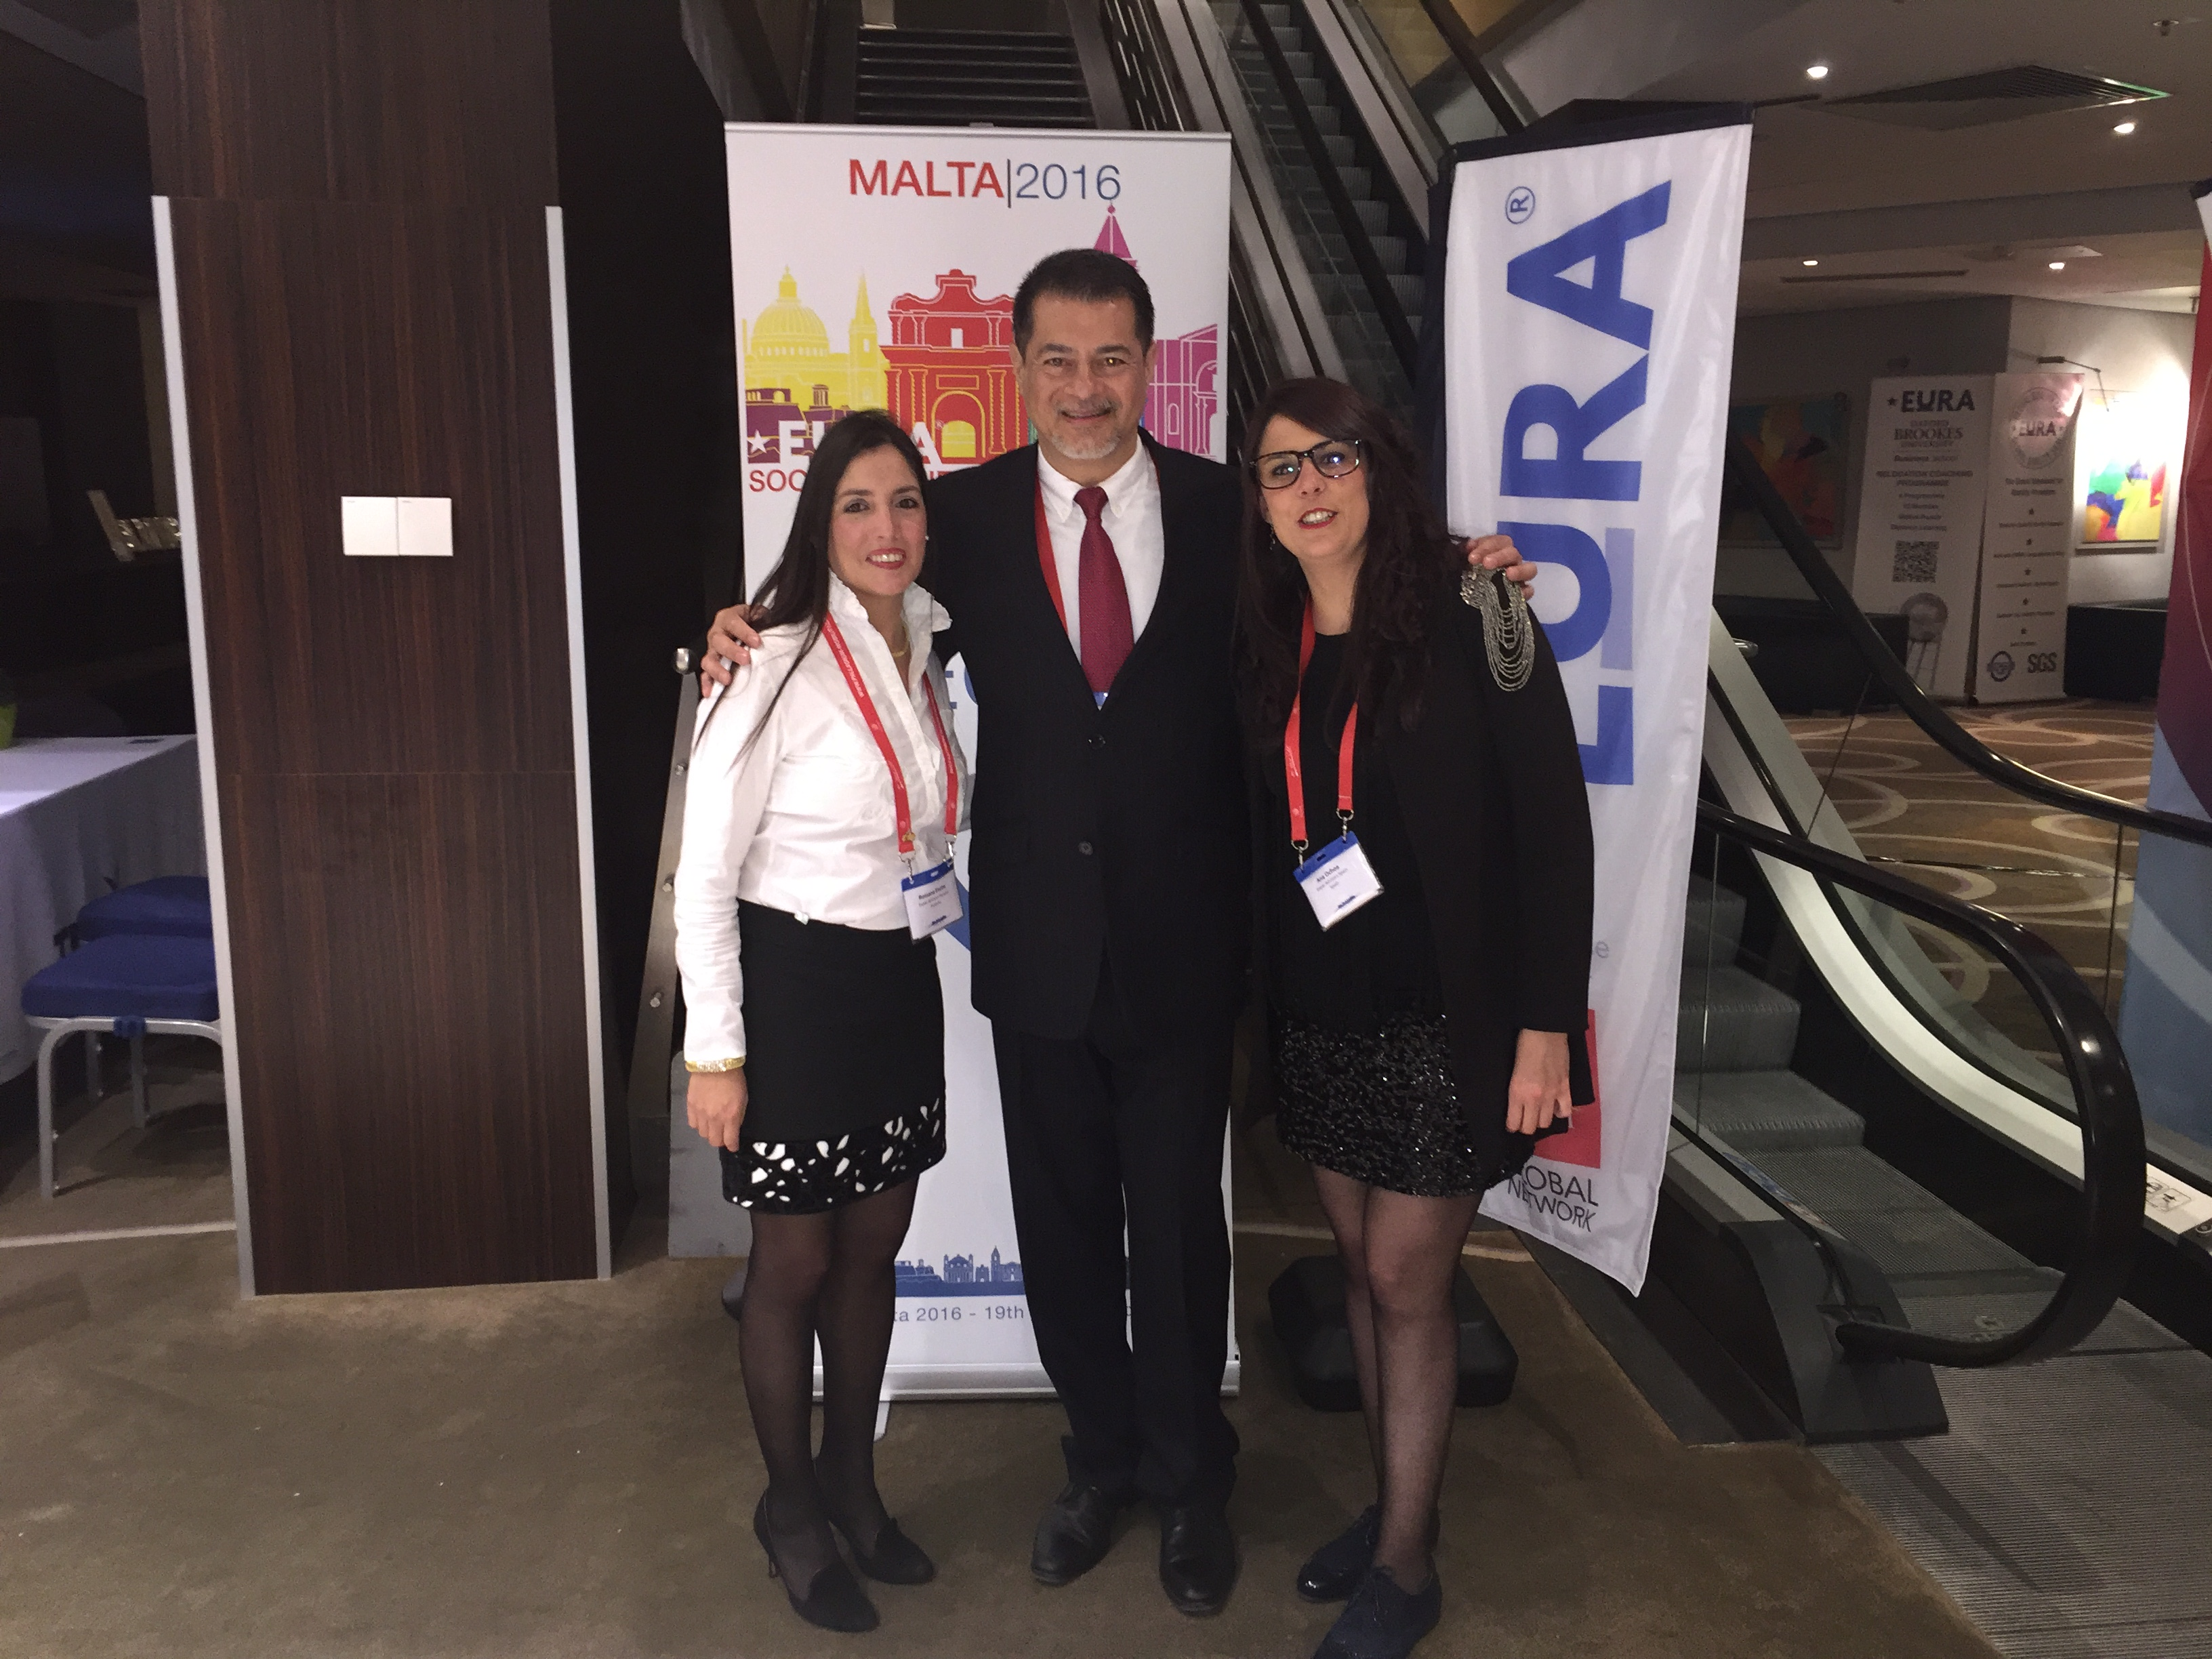 Expat Advisors EURA Malta 2016 24